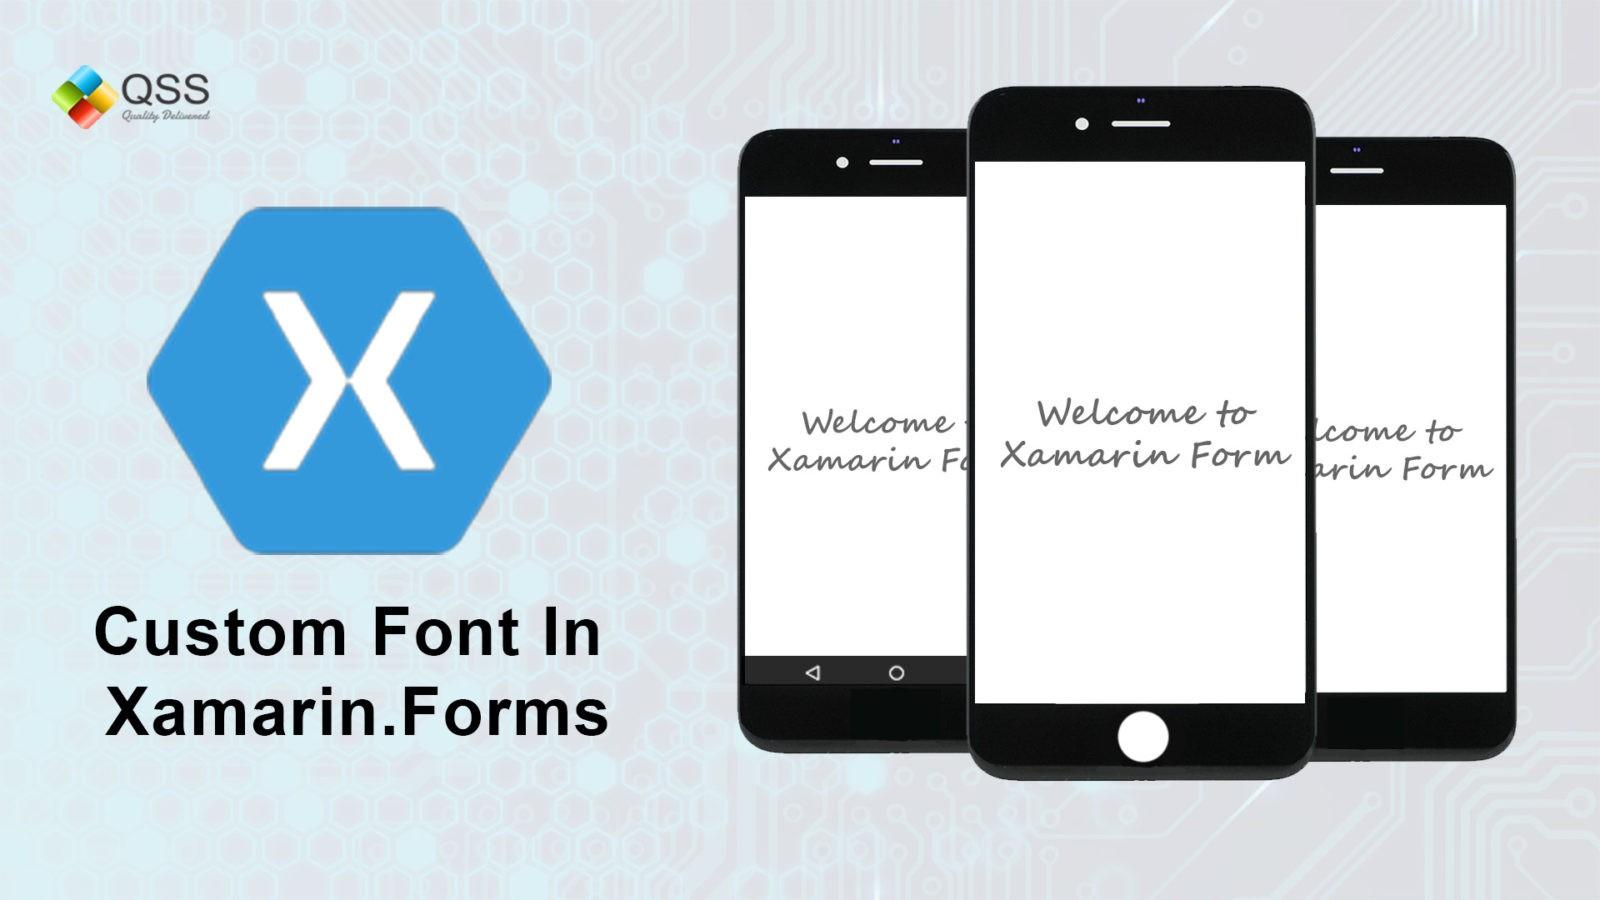 Custom Fonts in Xamarin Forms